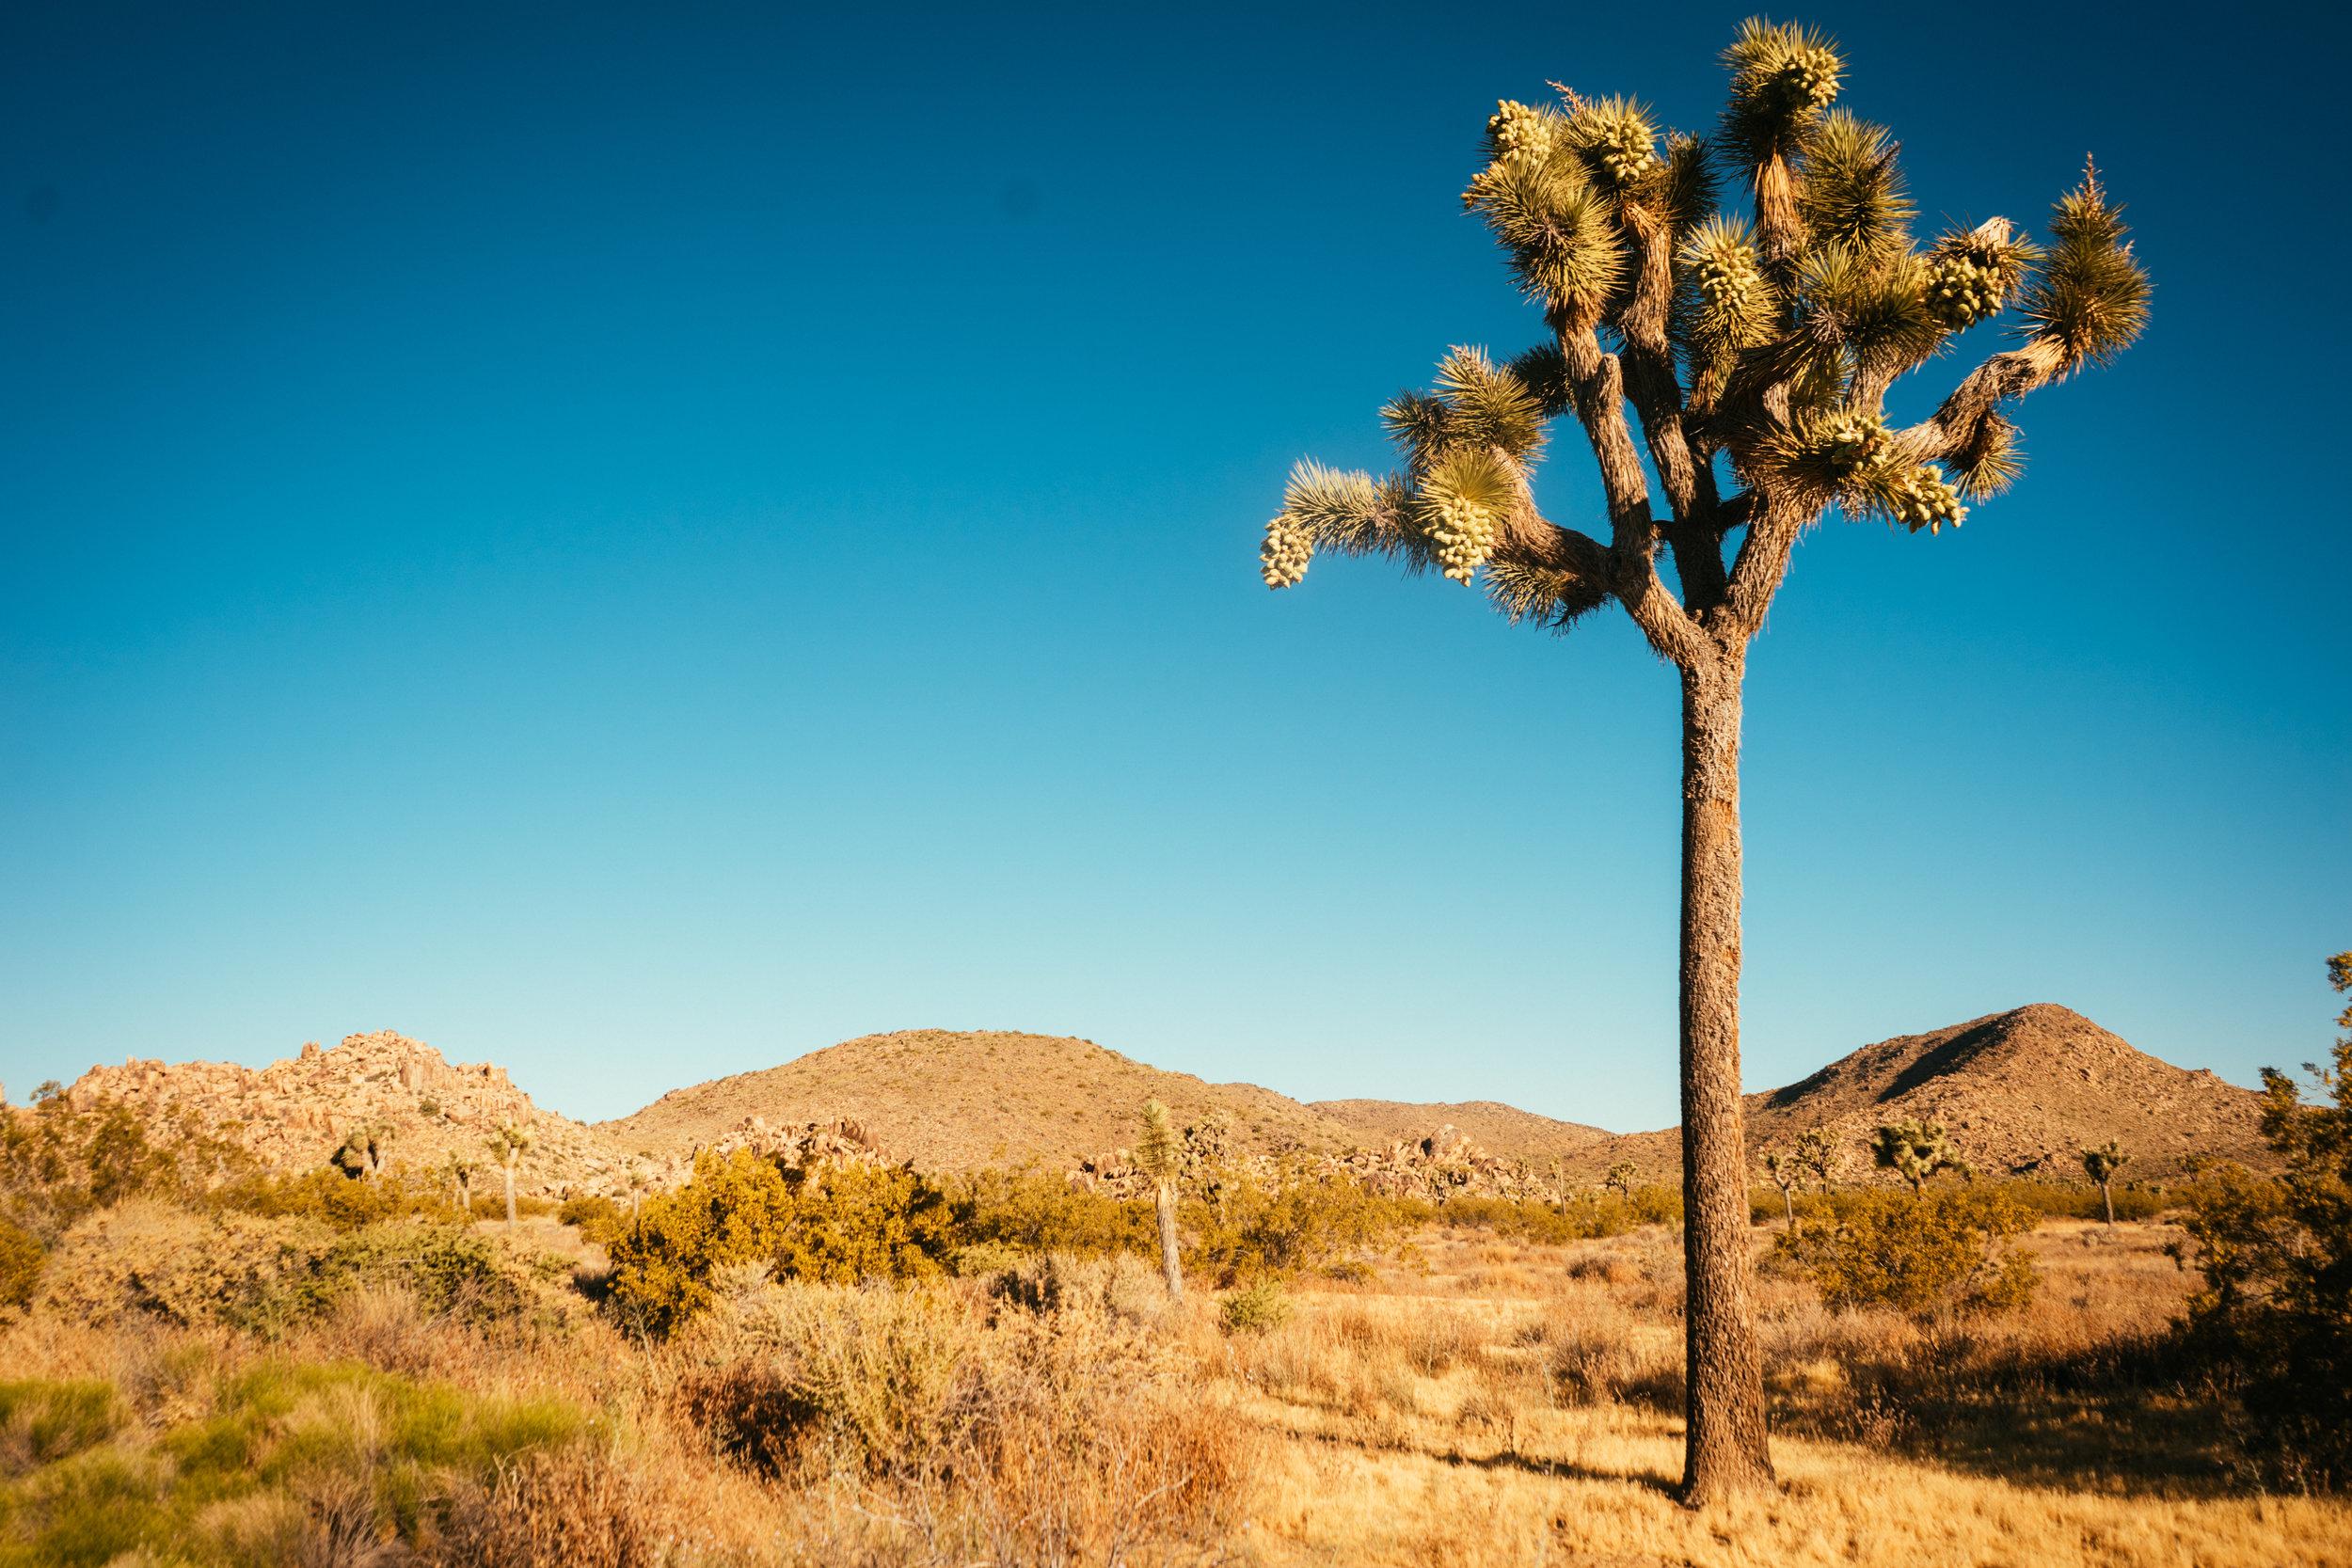 Photo Collection - Joshua tree national park